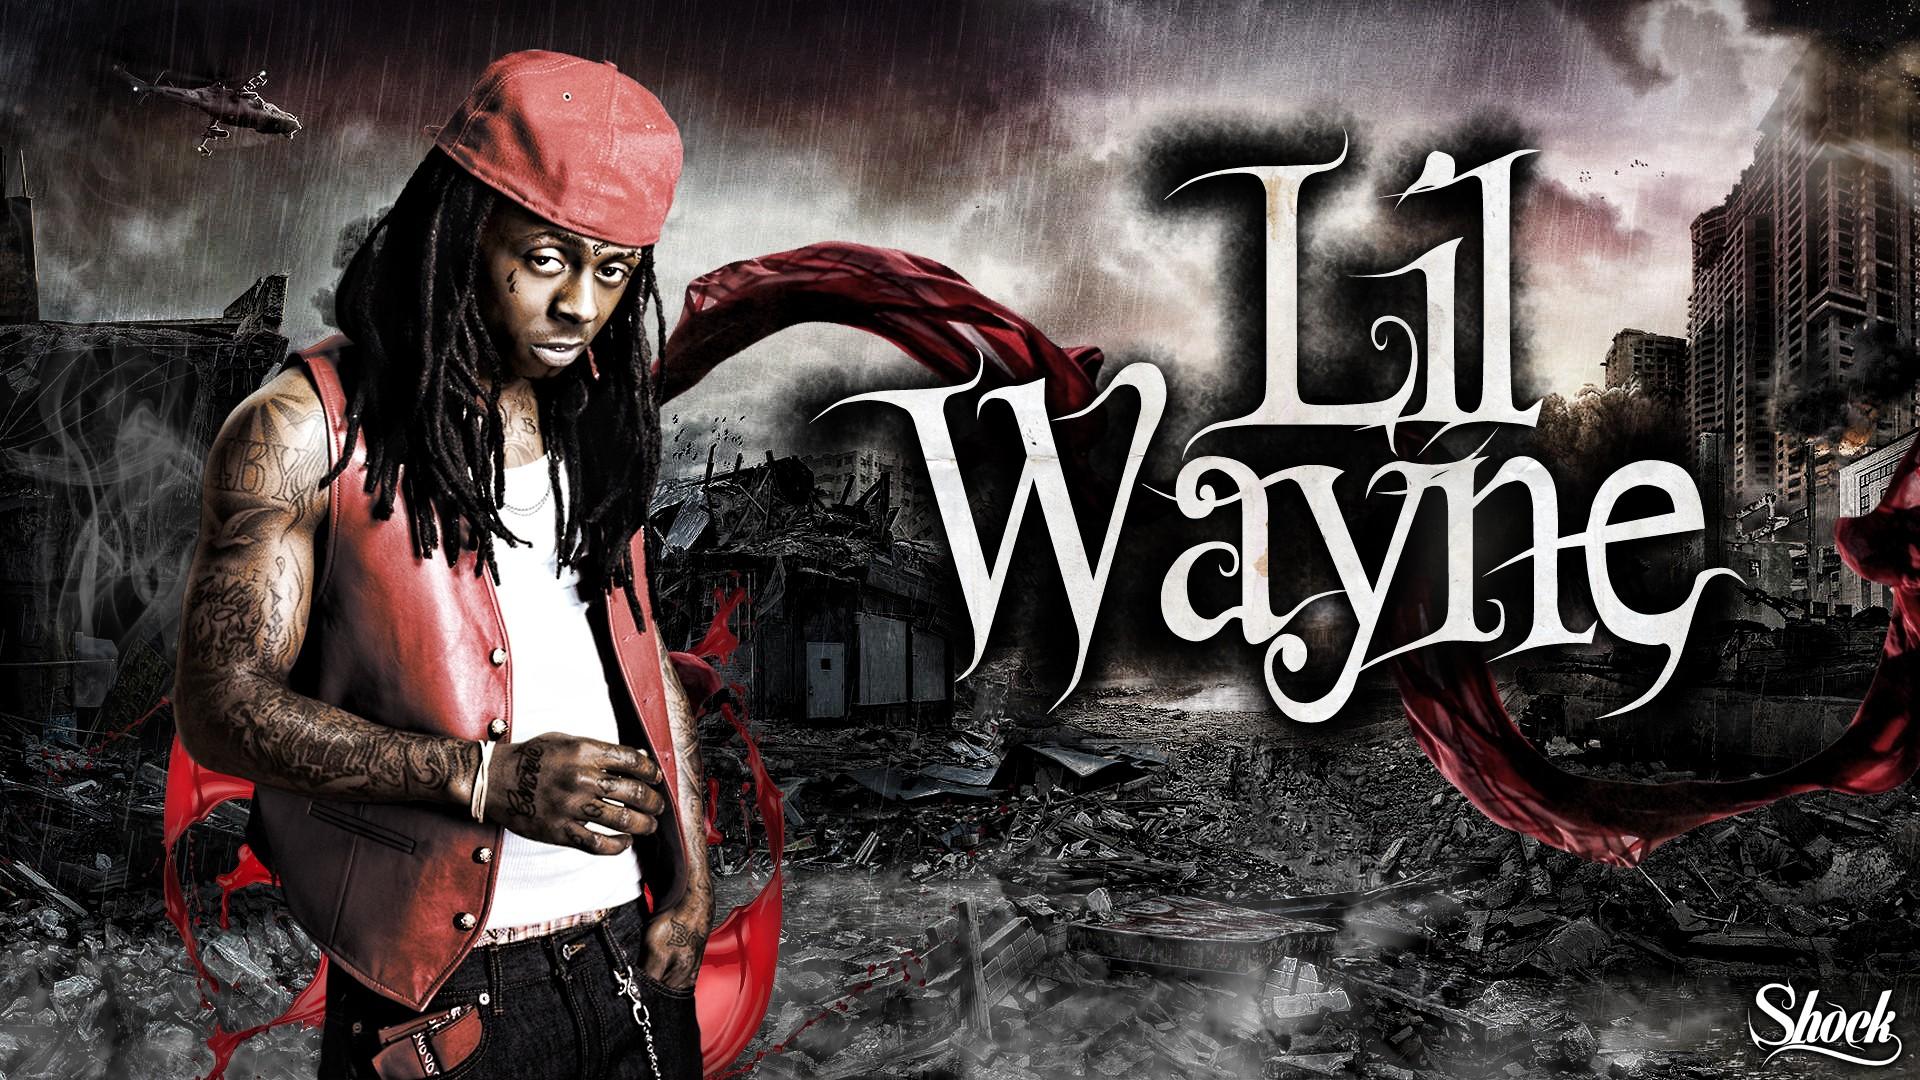 lil wayne wallpapers full - photo #6